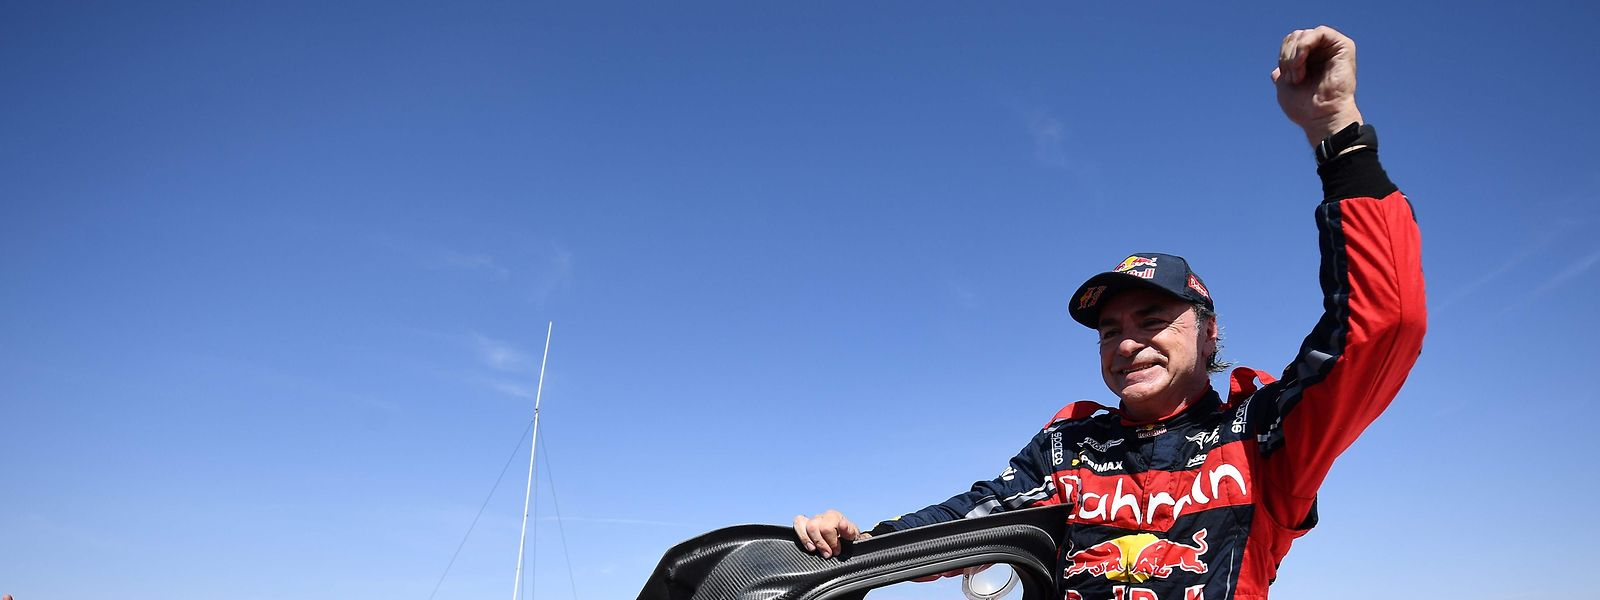 Carlos Sainz gewinnt die Rallye Dakar zum dritten Mal.